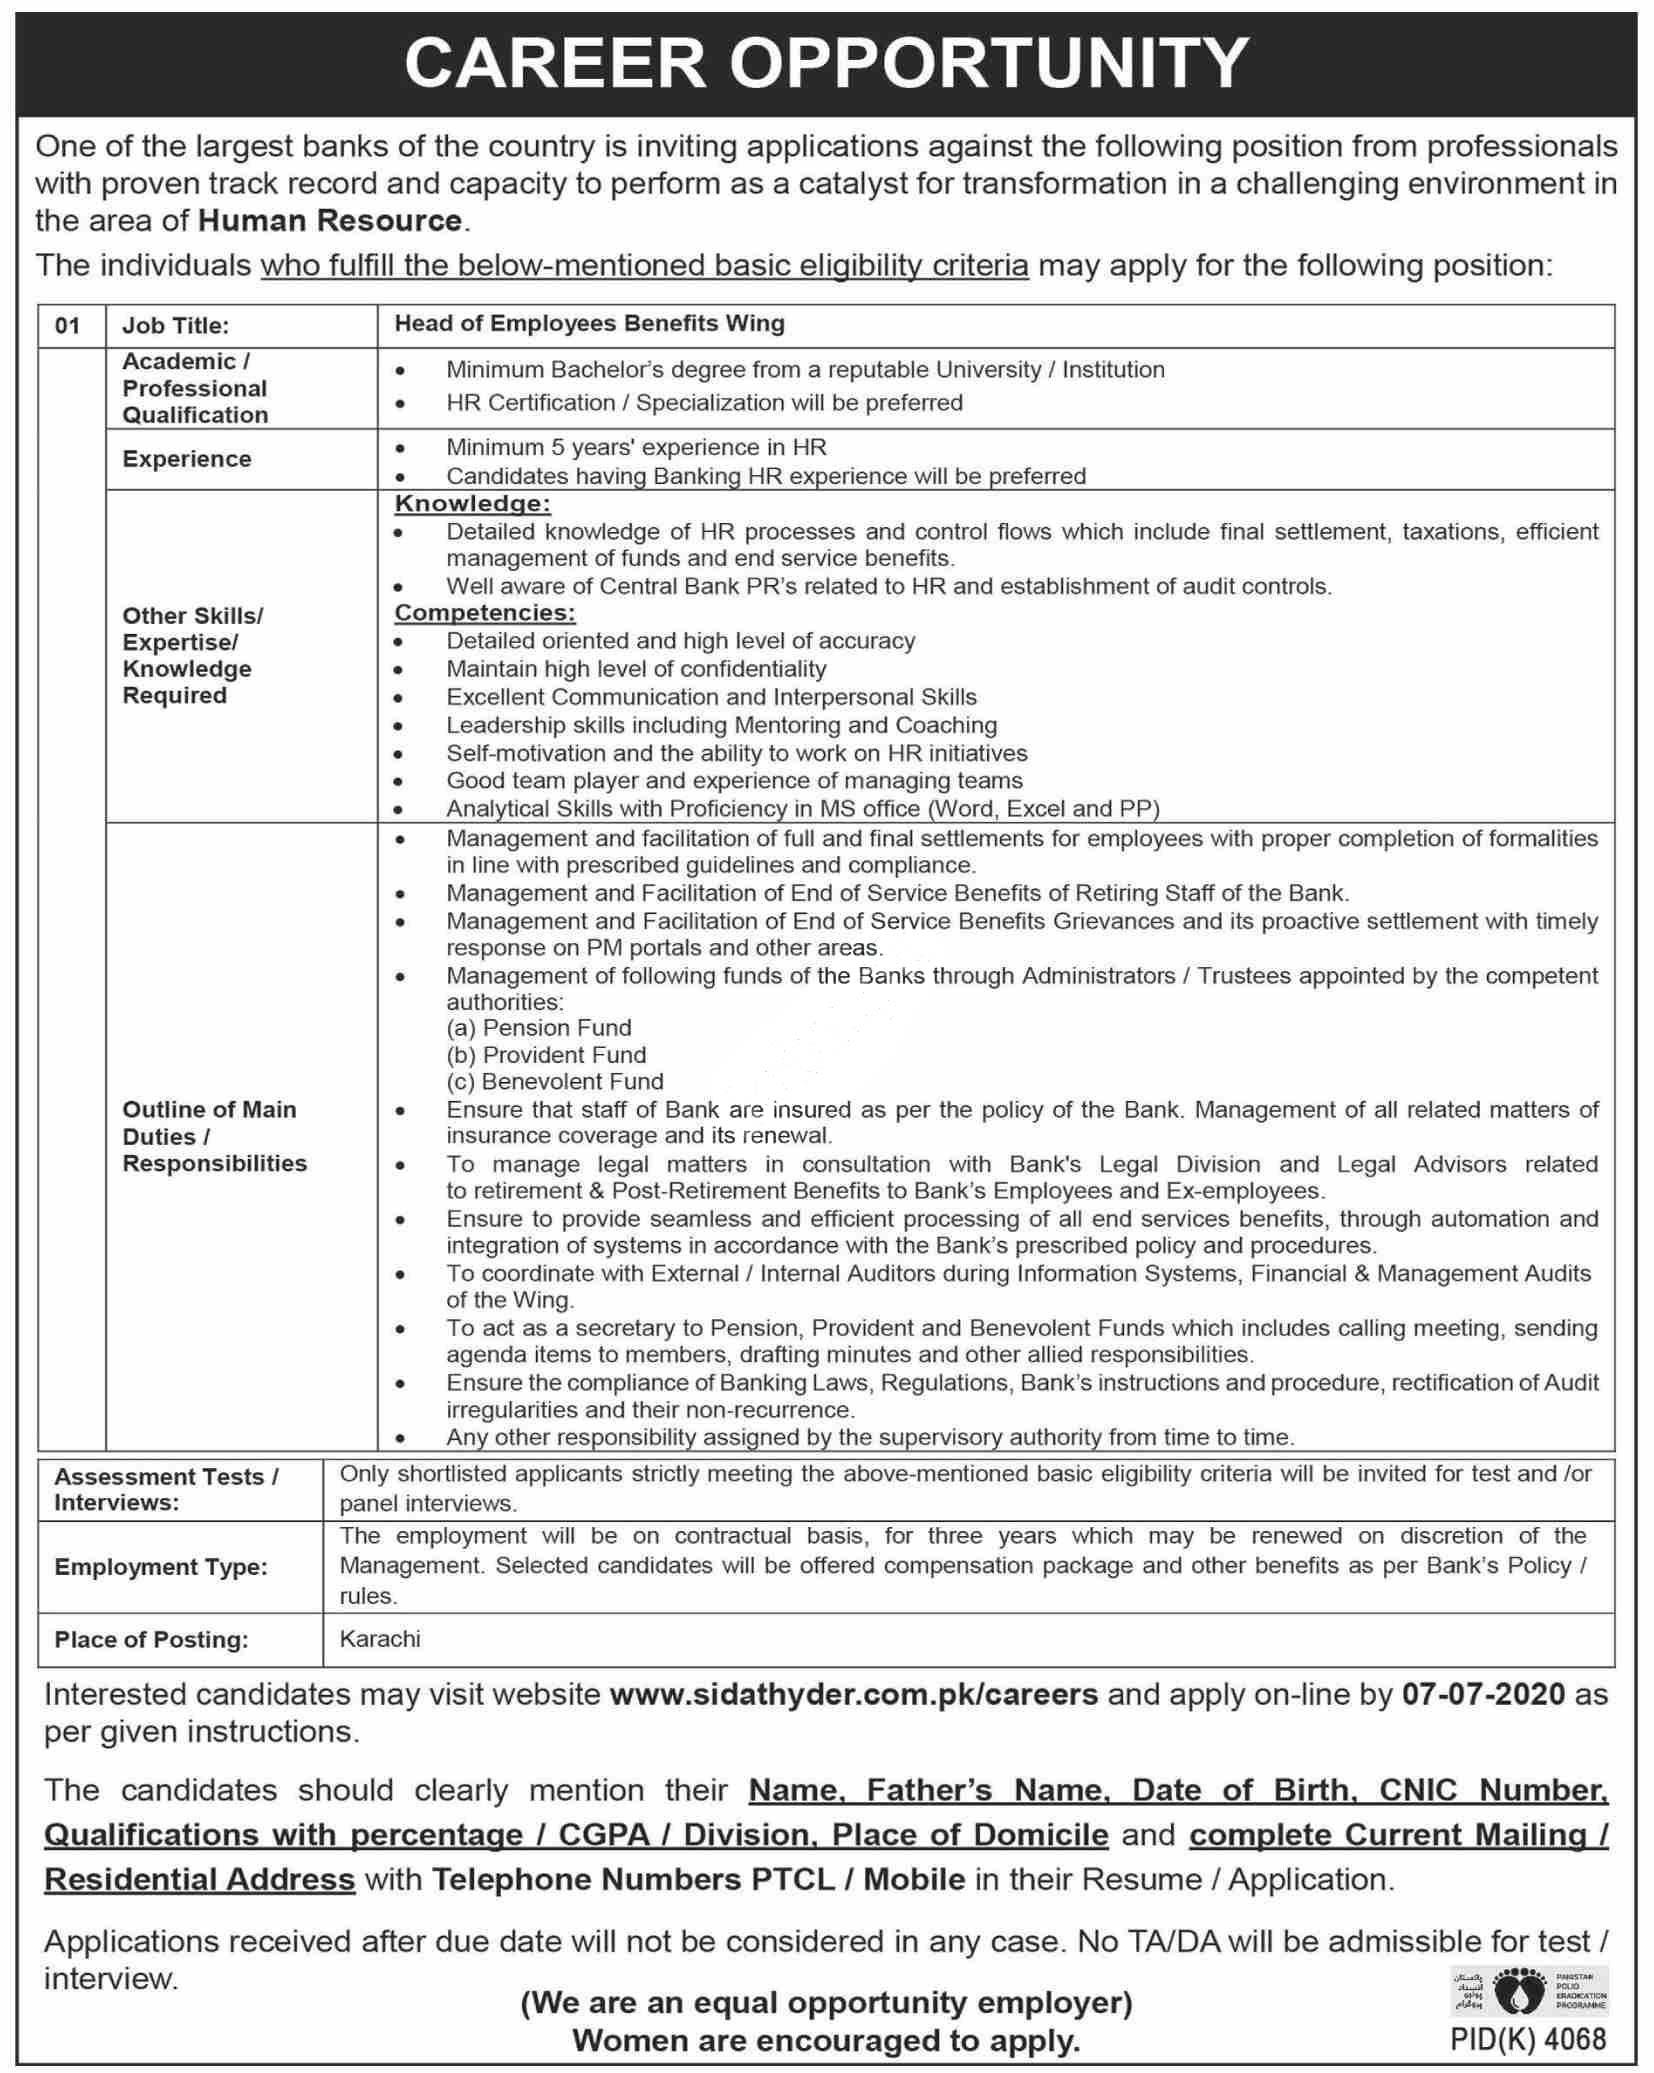 Sidat Hyder Morshed Associates Pvt Ltd Karachi Jobs 2020 Latest